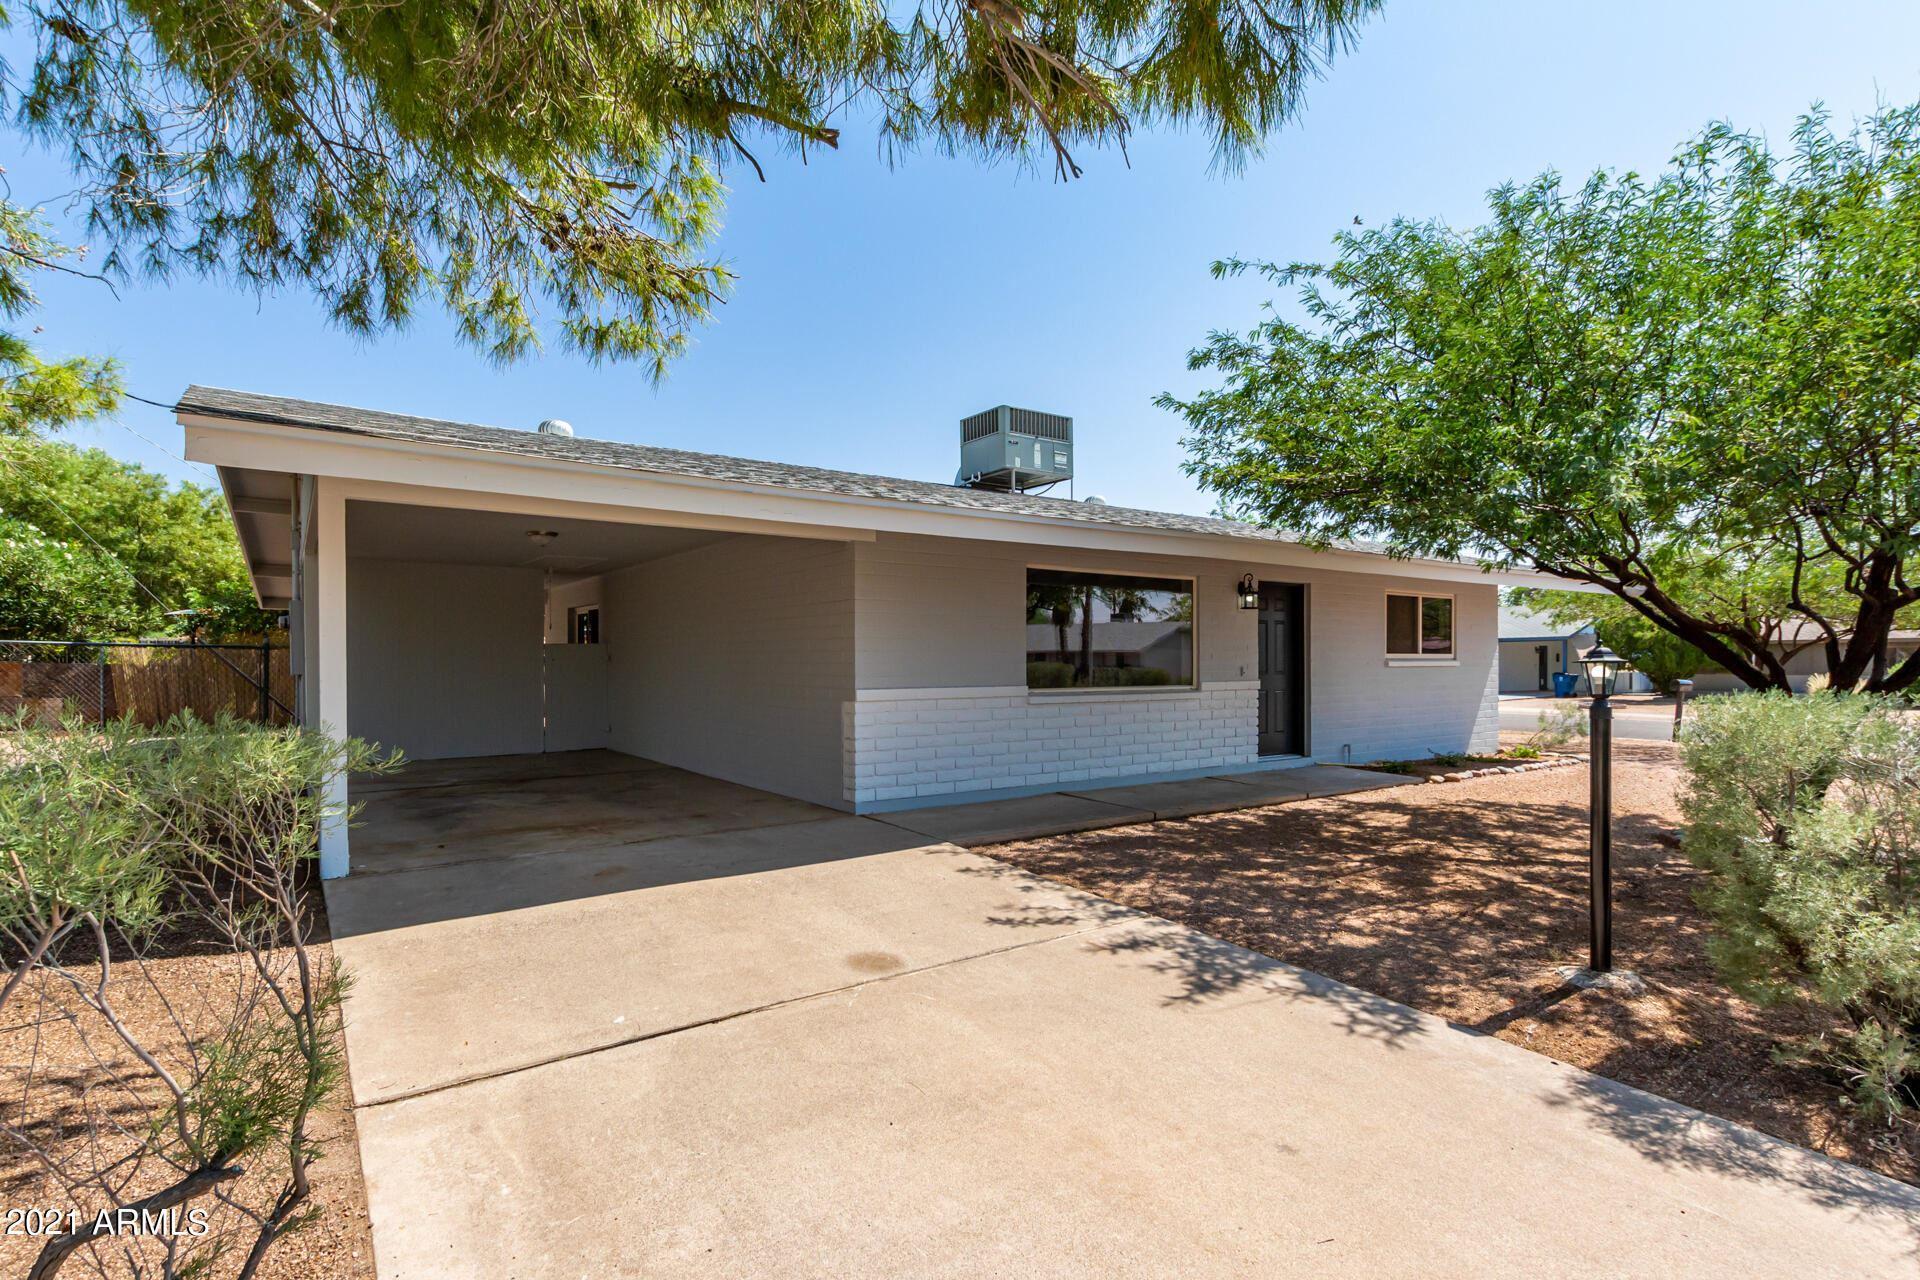 Photo of 966 W 4TH Avenue, Apache Junction, AZ 85120 (MLS # 6294848)